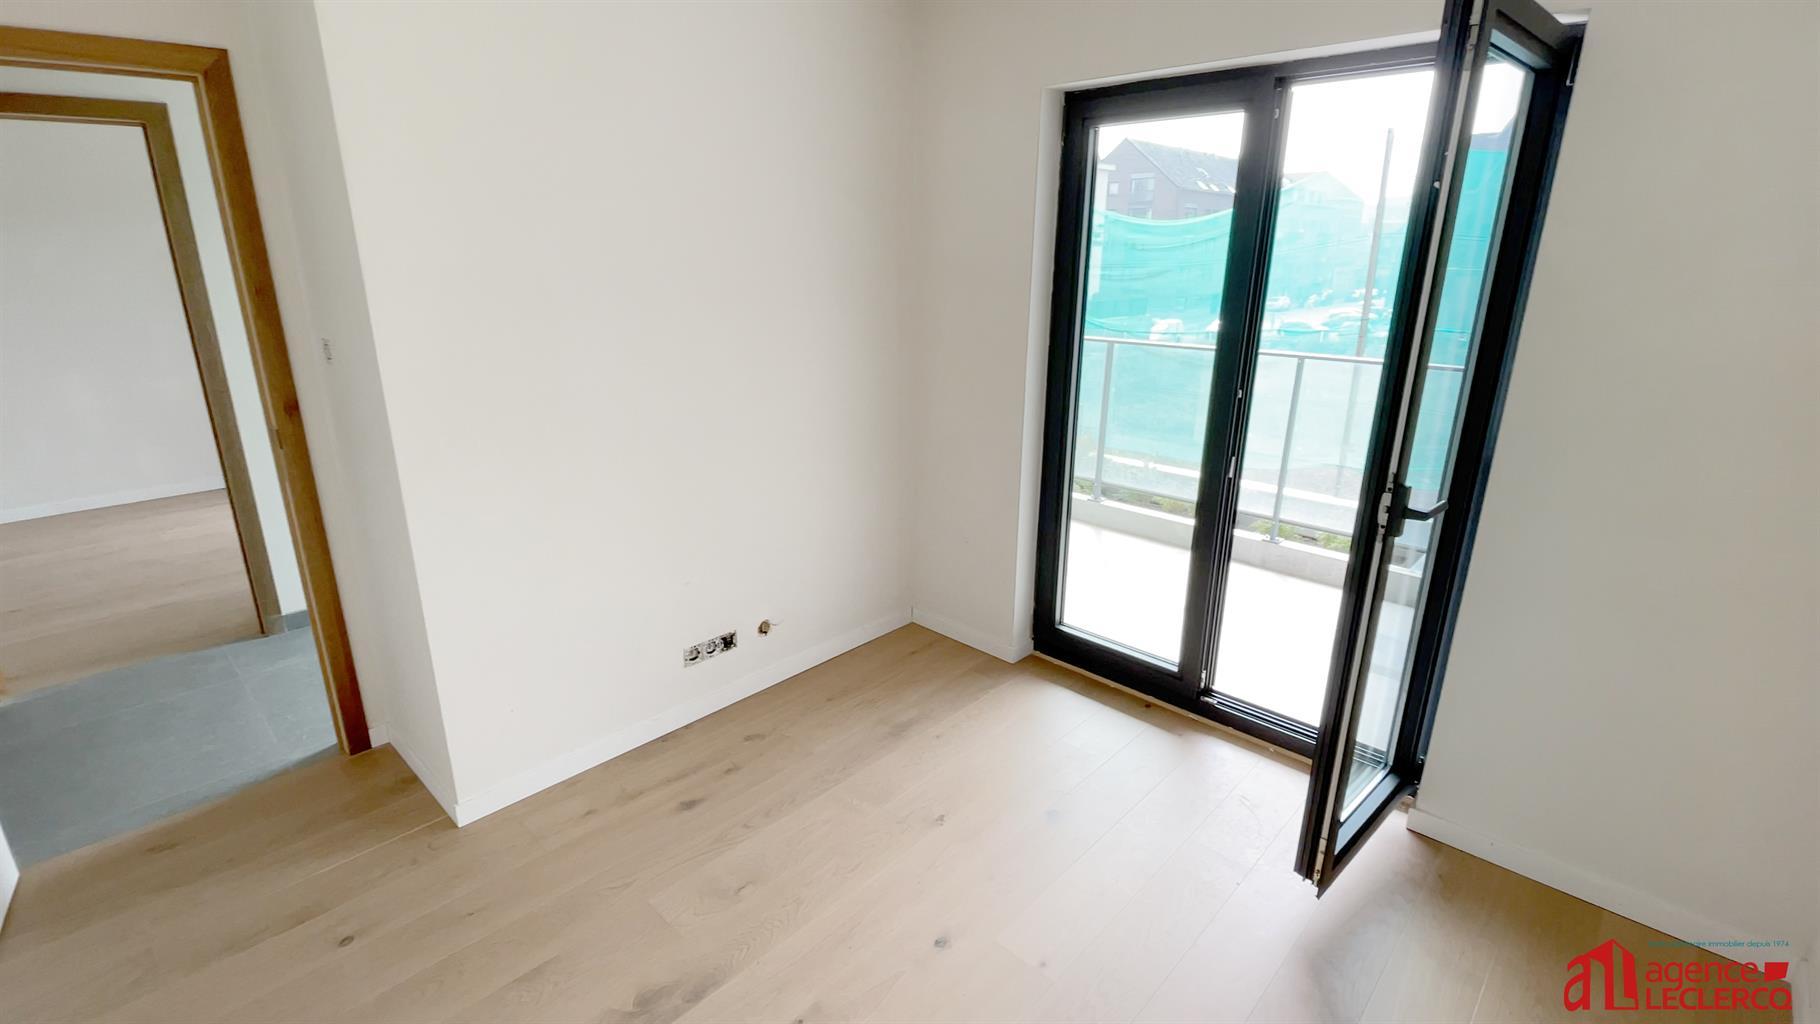 Appartement - Tournai - #4189779-5